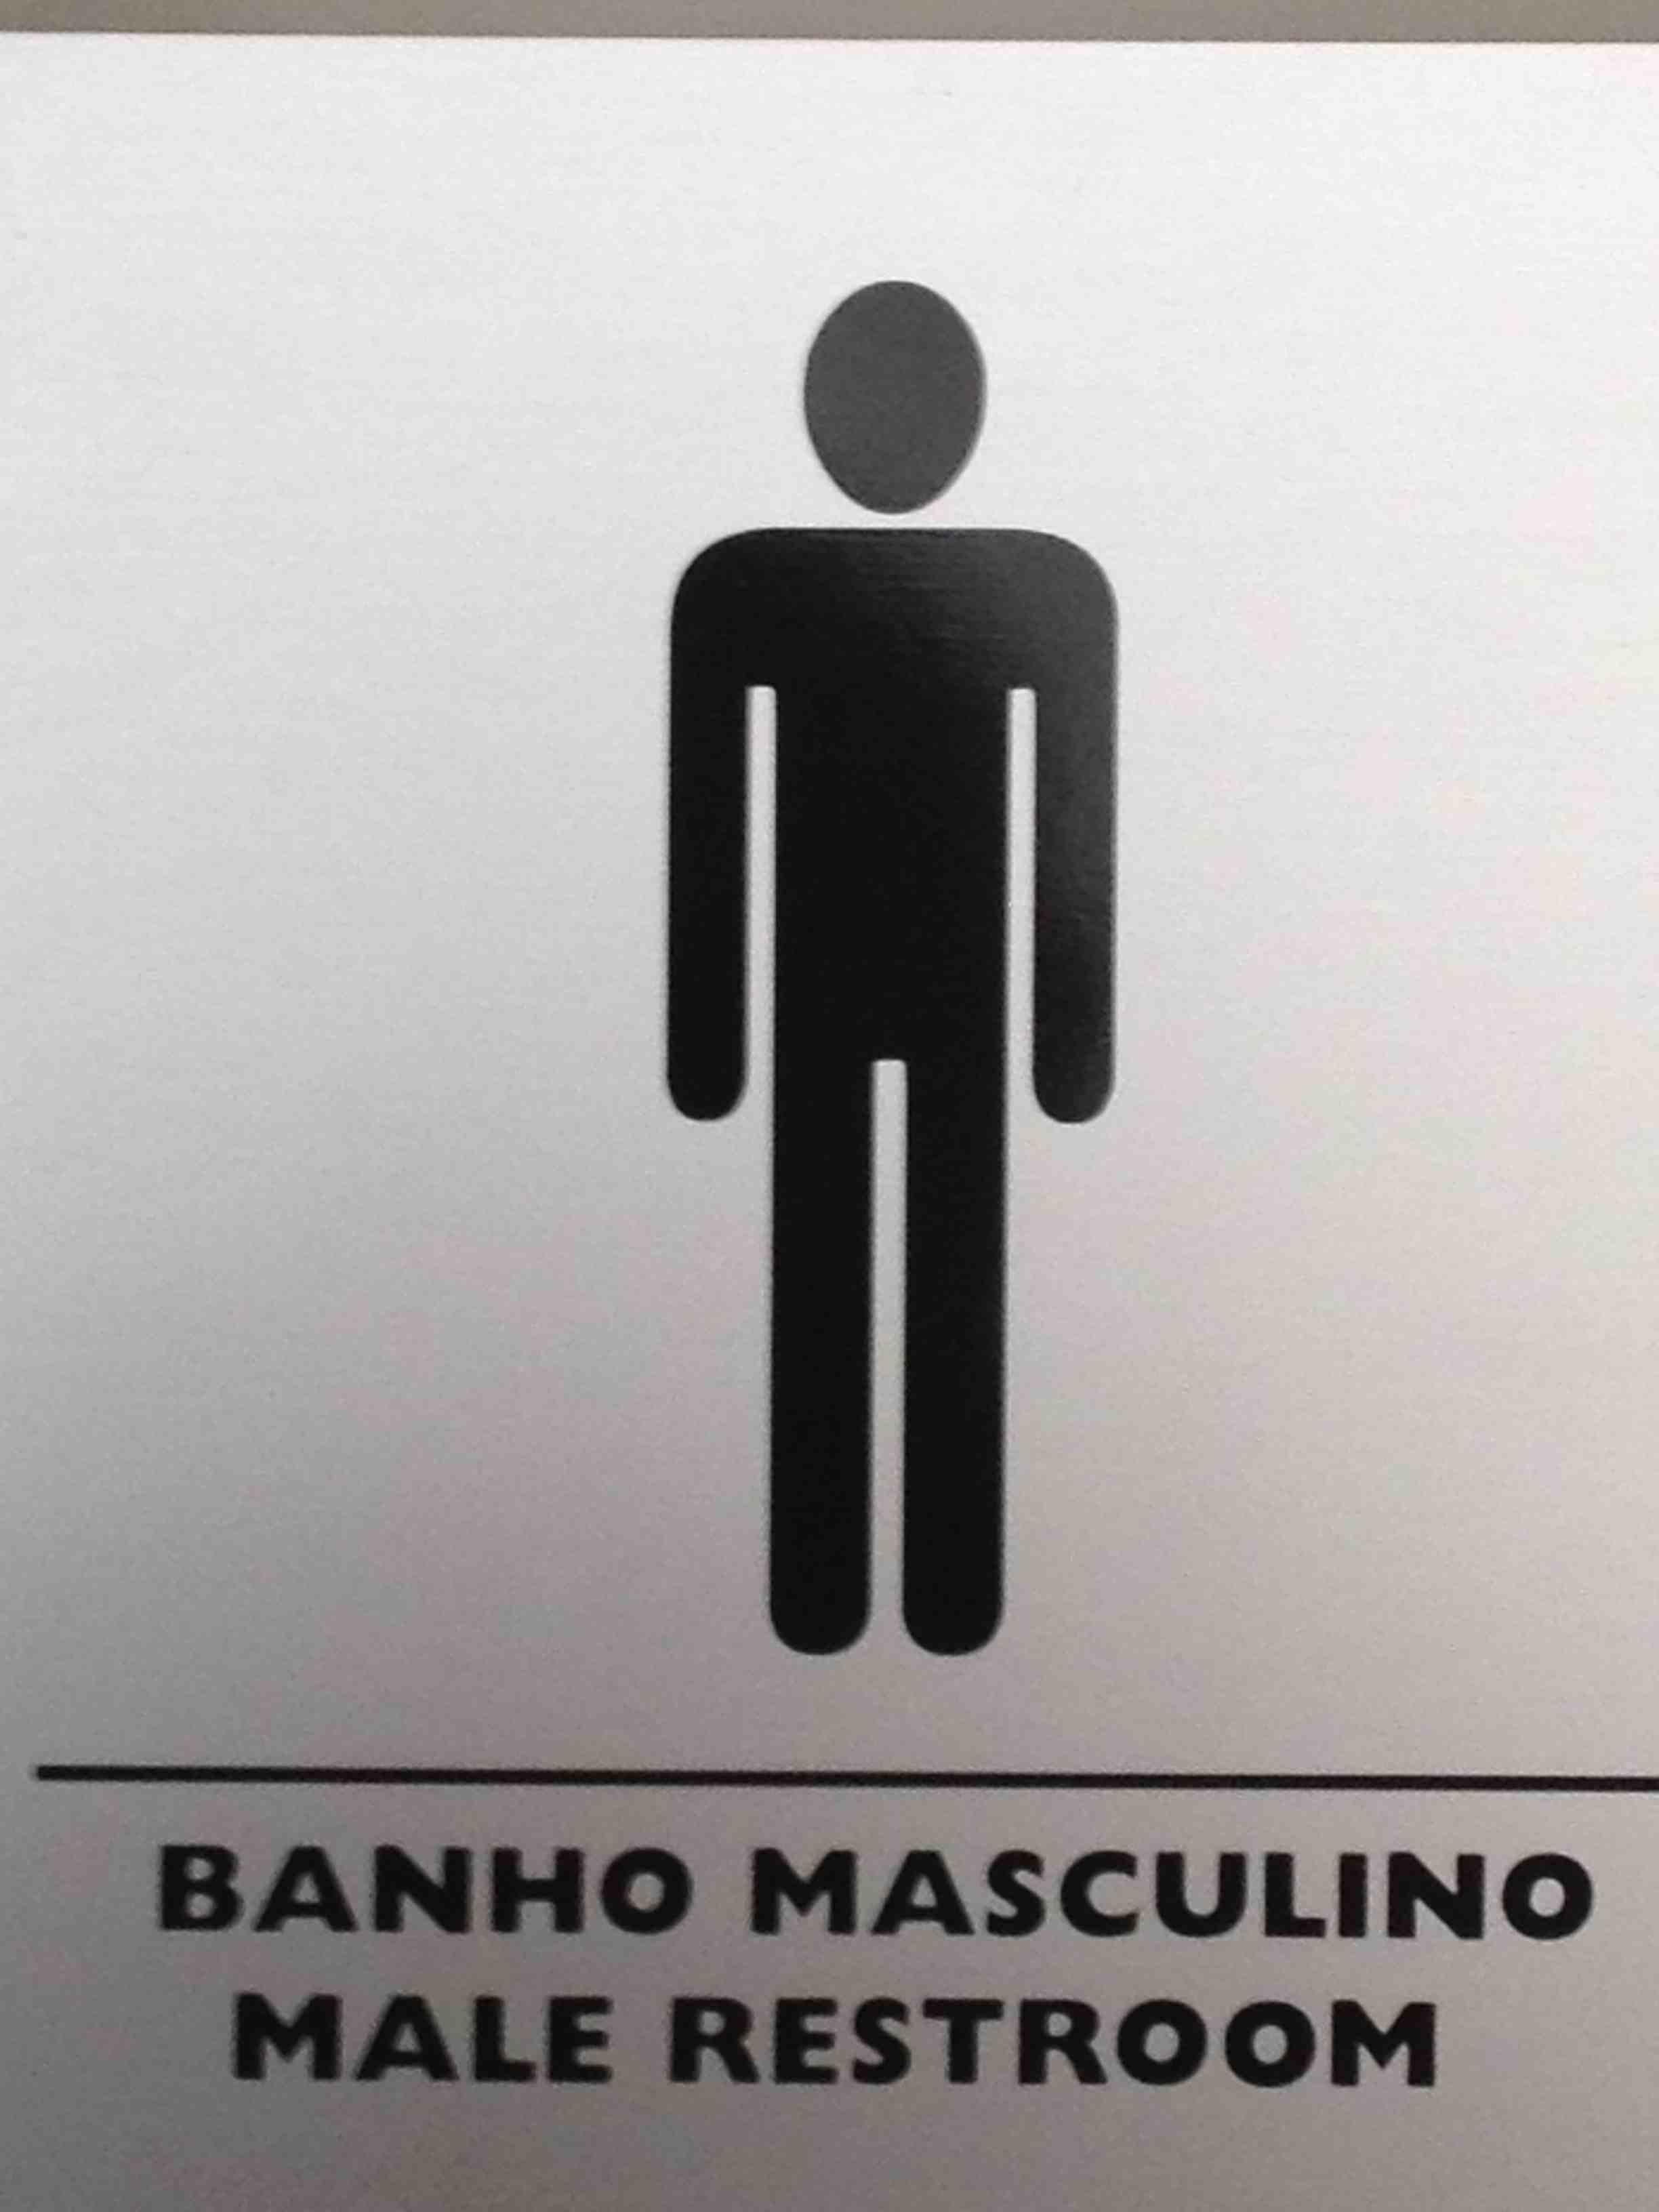 Pin Placa Aviso Sinalizacao Banheiro Feminino Masculino Pictures on Pinterest -> Avisos Banheiro Feminino